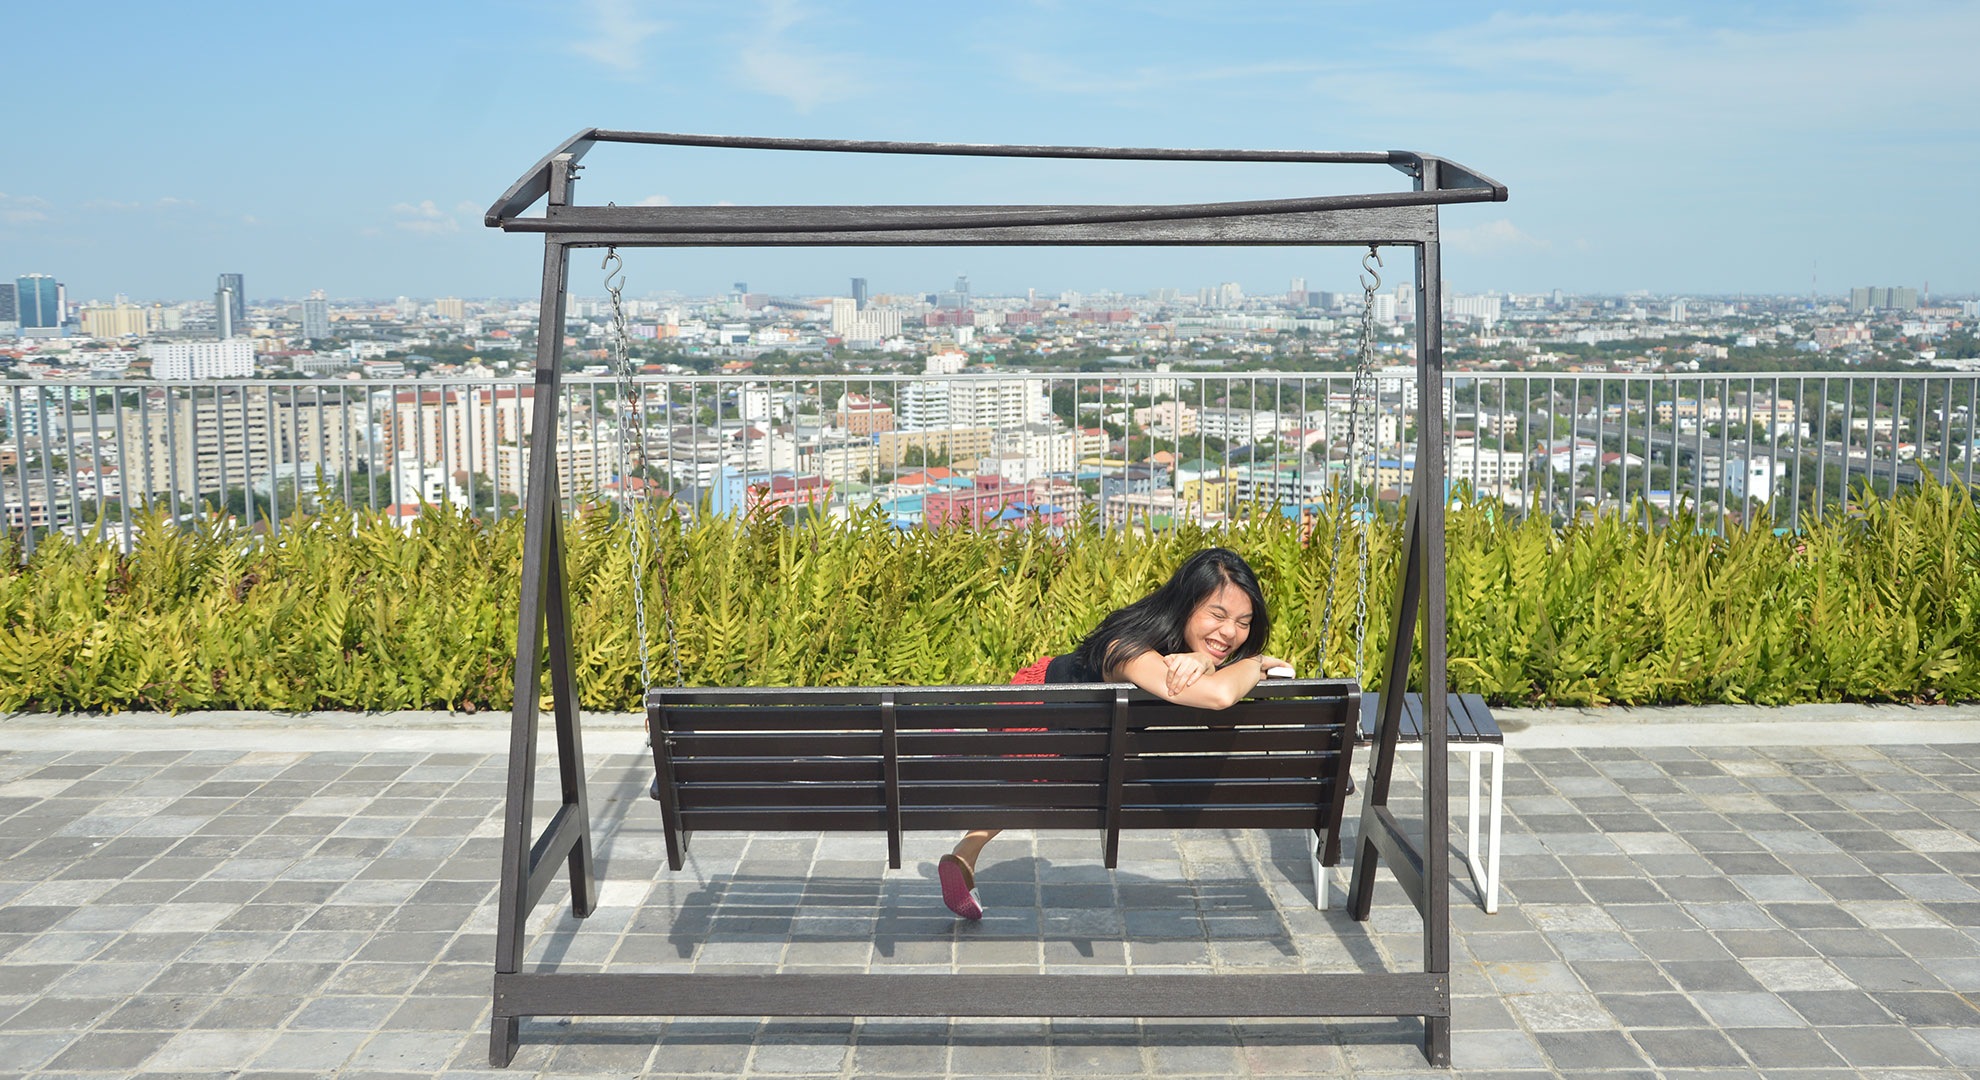 Bangkok-Tipps für Skeptiker | AirBnB in BKK | www.dearlicious.com  | Dear Nitjakan Bunbuamas